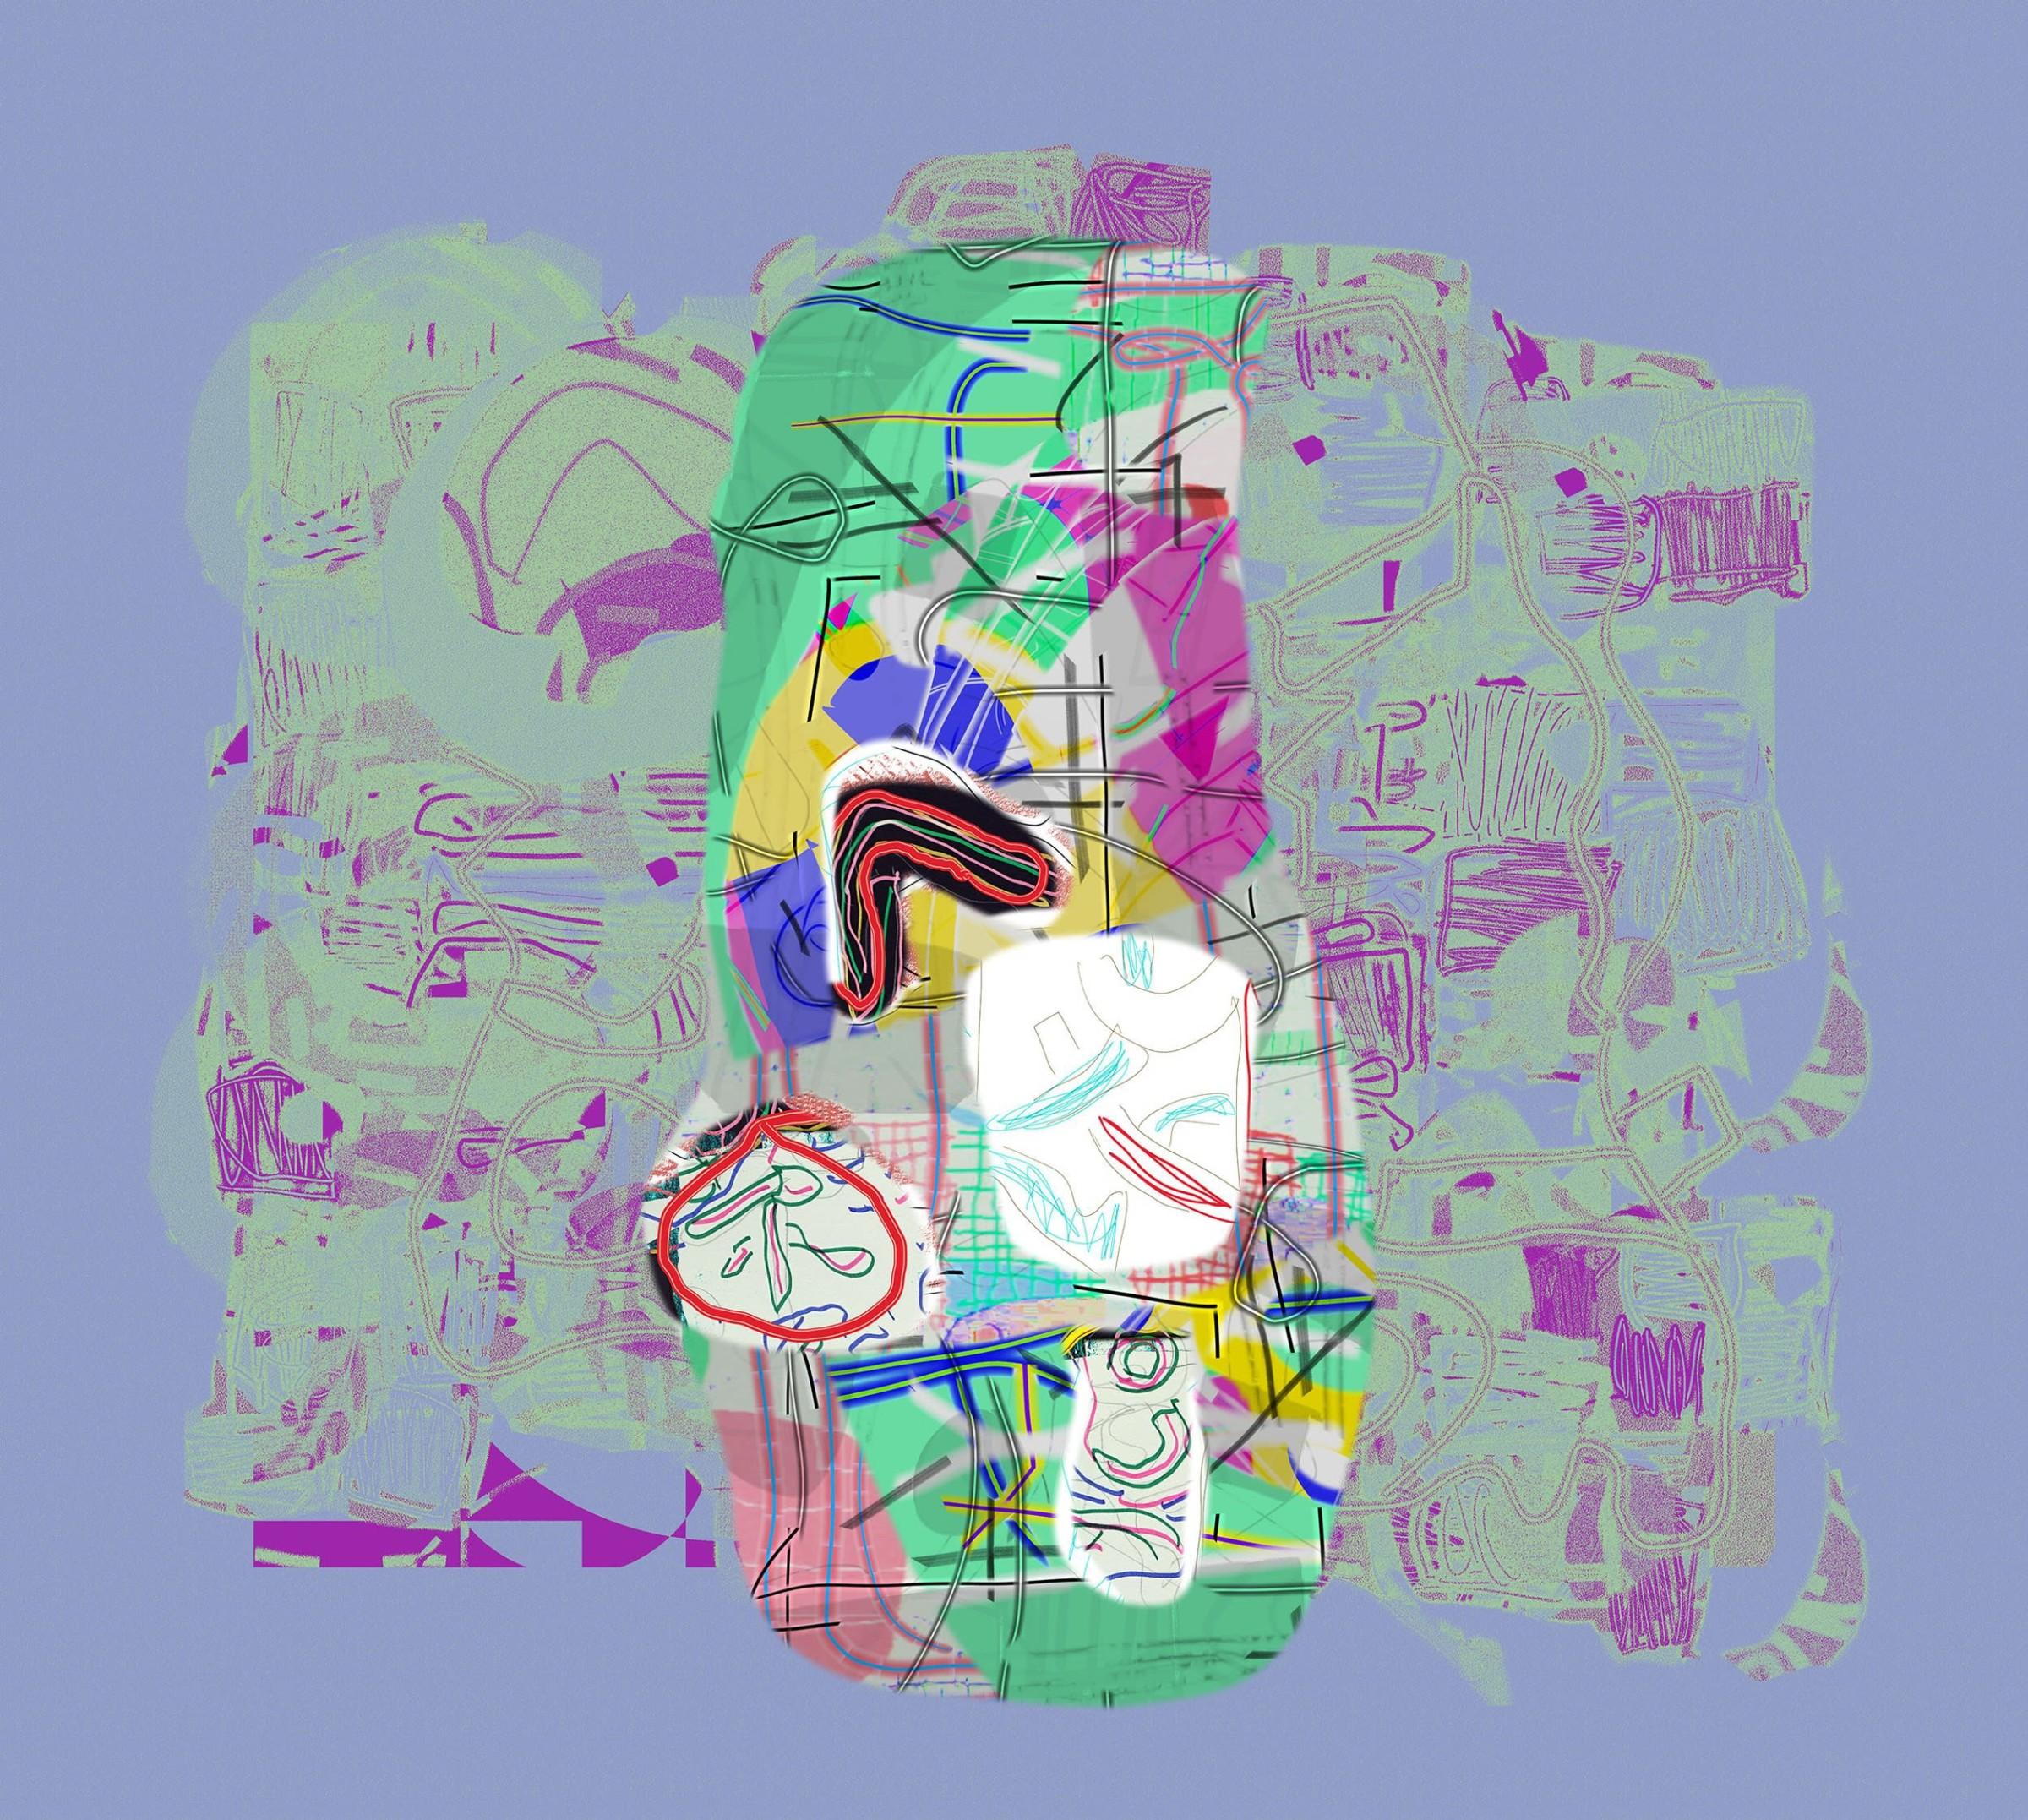 "<span class=""link fancybox-details-link""><a href=""/artists/32-james-faure-walker/works/12374-james-faure-walker-ethodyne/"">View Detail Page</a></span><div class=""artist""><span class=""artist""><strong>James Faure Walker</strong></span></div><div class=""title""><em>Ethodyne</em></div><div class=""medium"">archival inkjet print</div><div class=""dimensions"">Frame: 64 x 70 cm<br /> Artwork: 48 x 54 cm</div><div class=""price"">£1,050.00</div>"